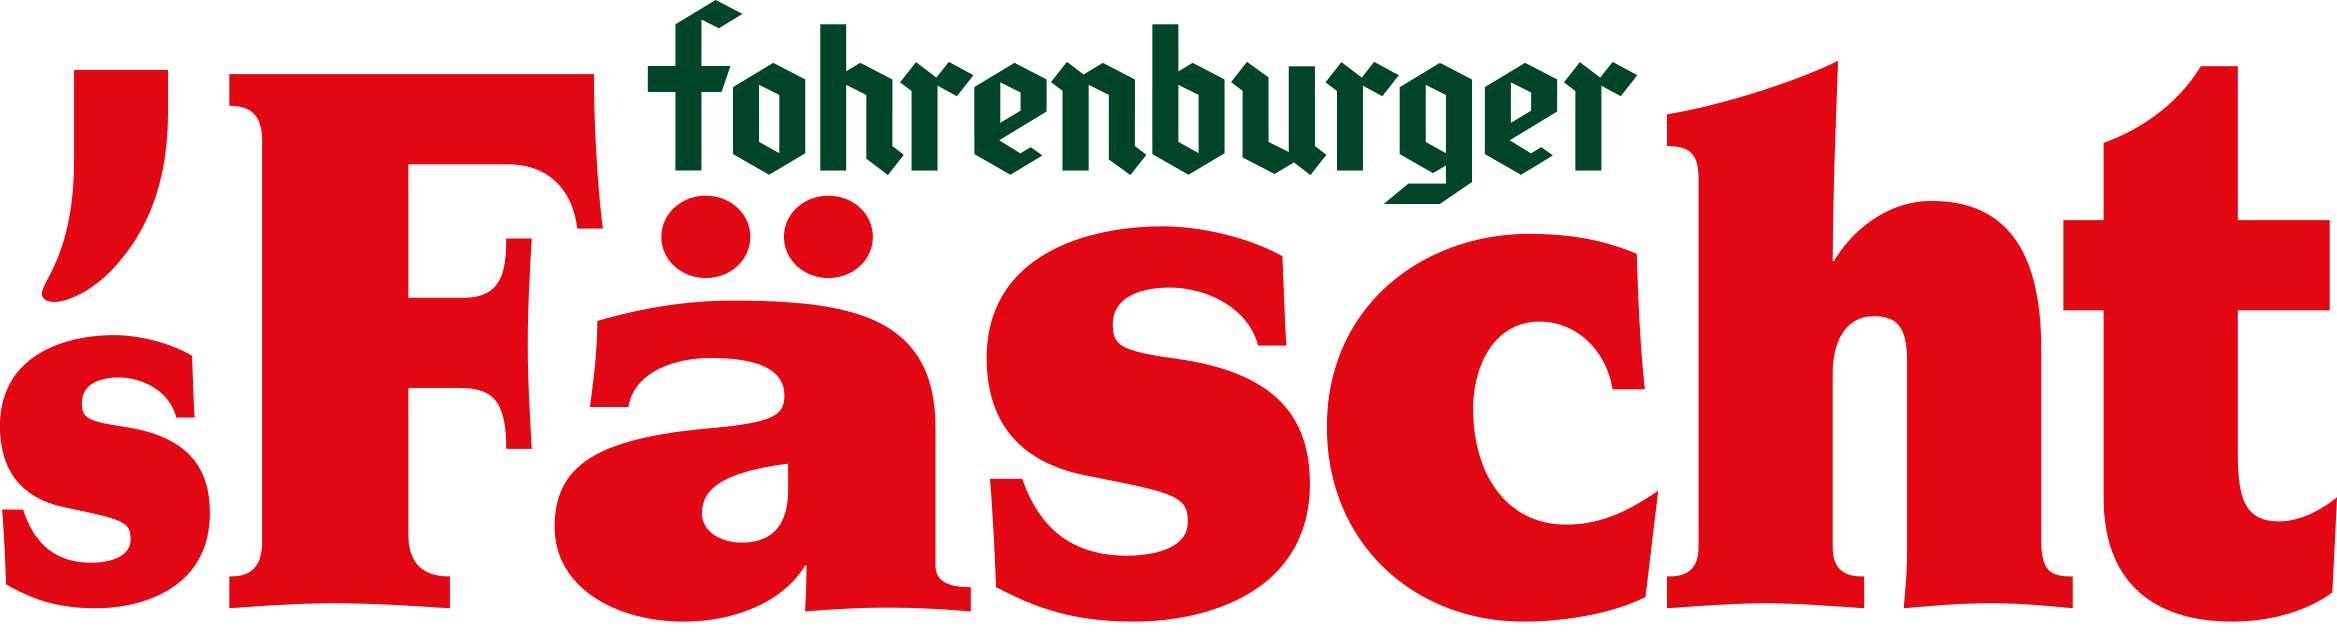 Logo sfäscht fohrenburger